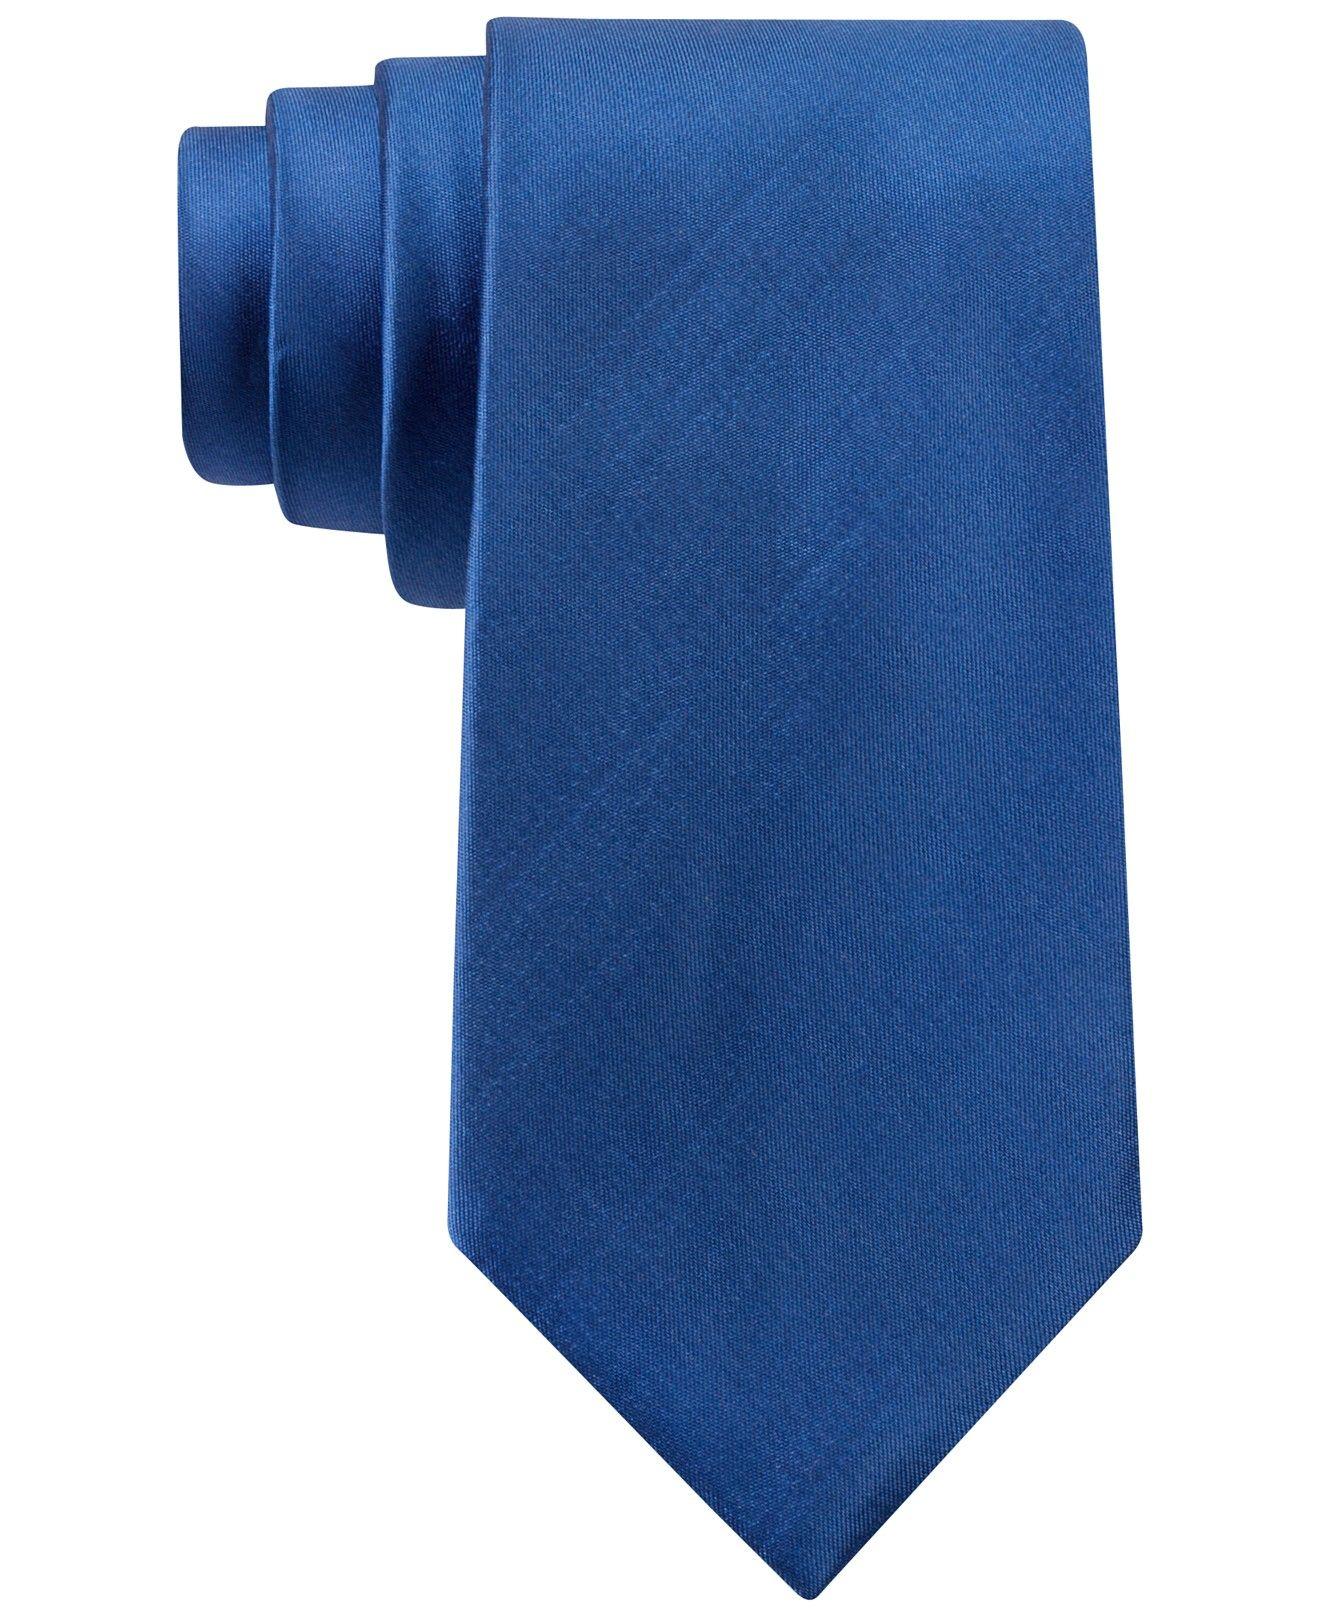 MICHAEL Michael Kors Sapphire Solid II Slim Tie - Tuxedos ...